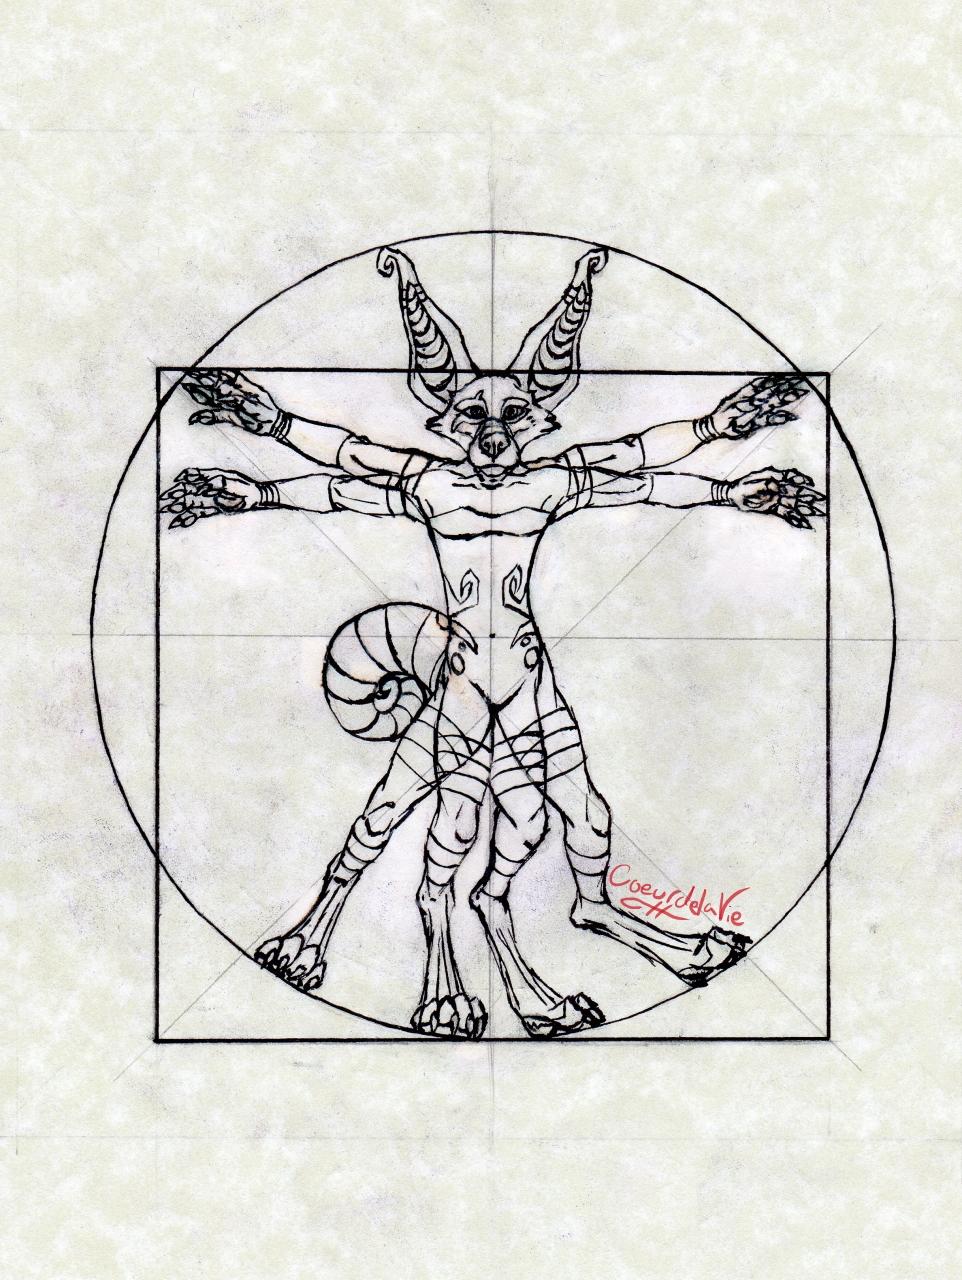 Most recent image: Vitruvian Crux